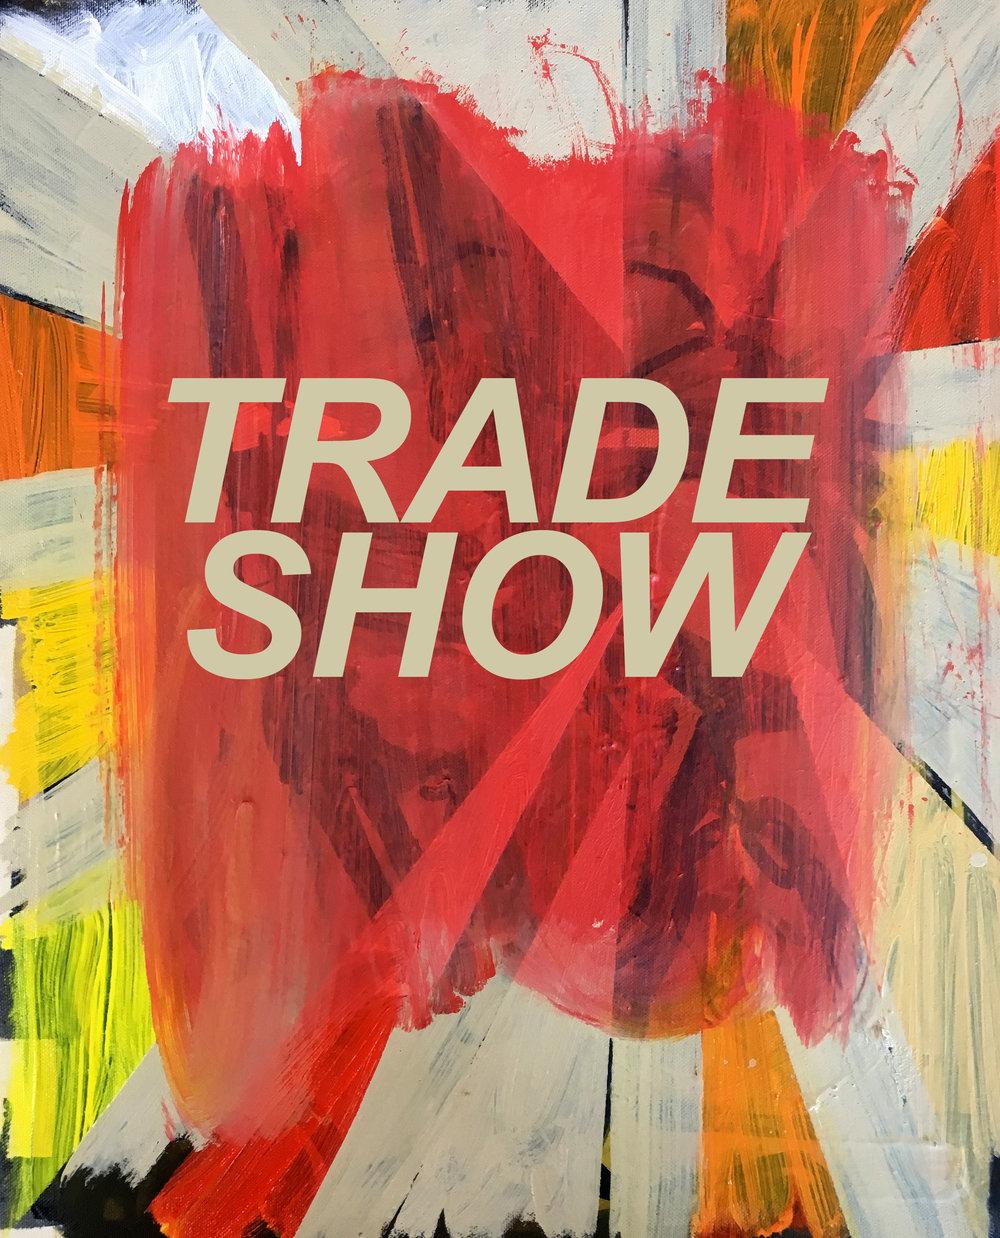 Trade Show_Bielik243.jpg